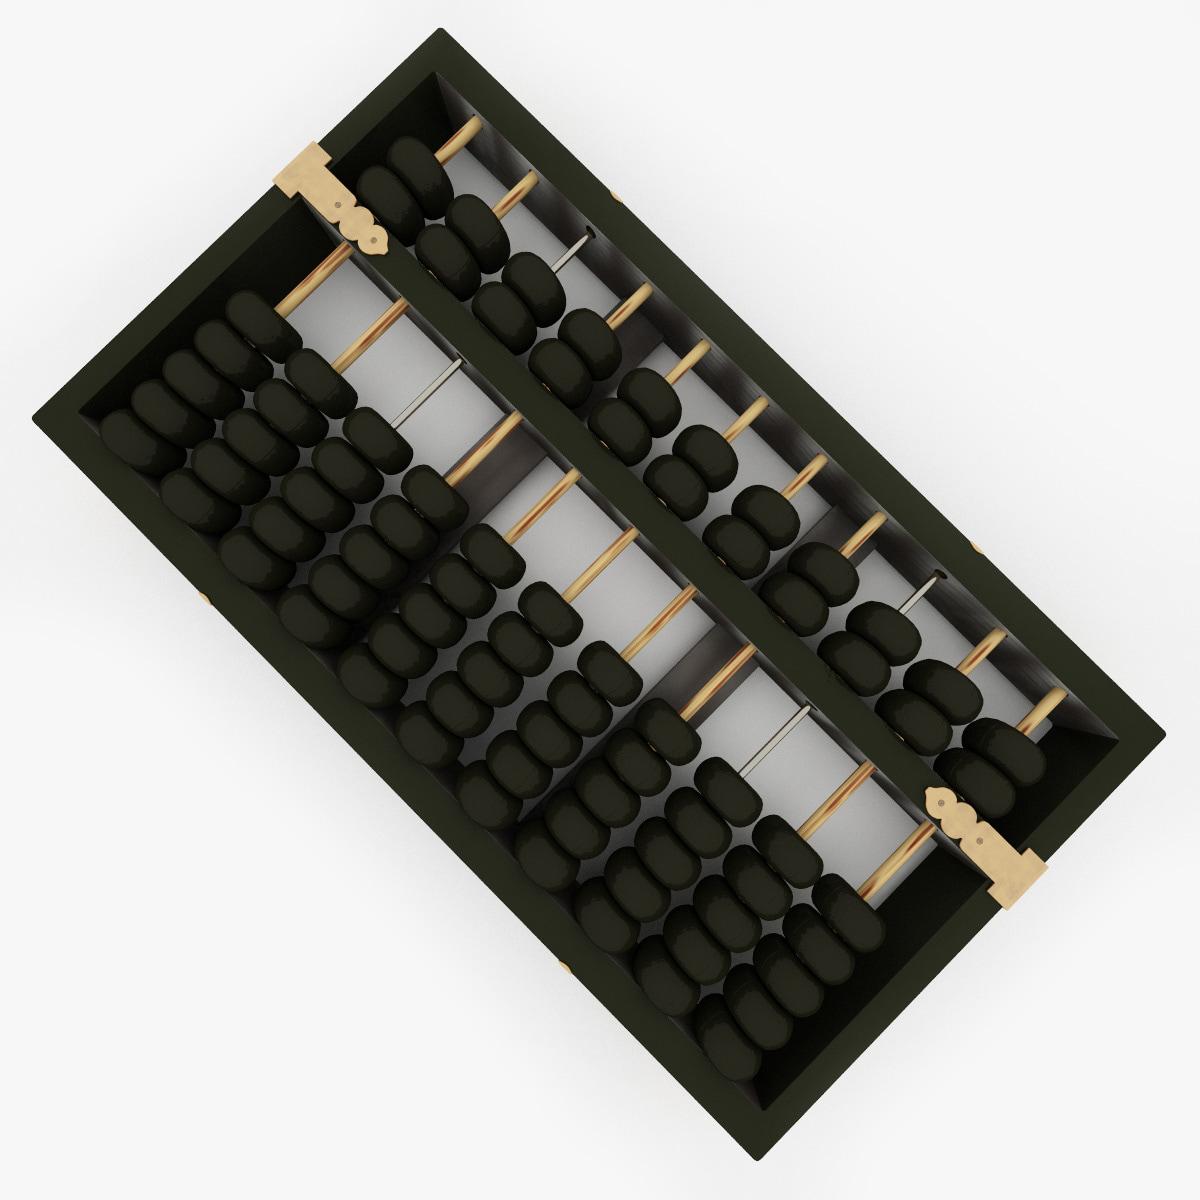 Abacus_V2_00.jpg